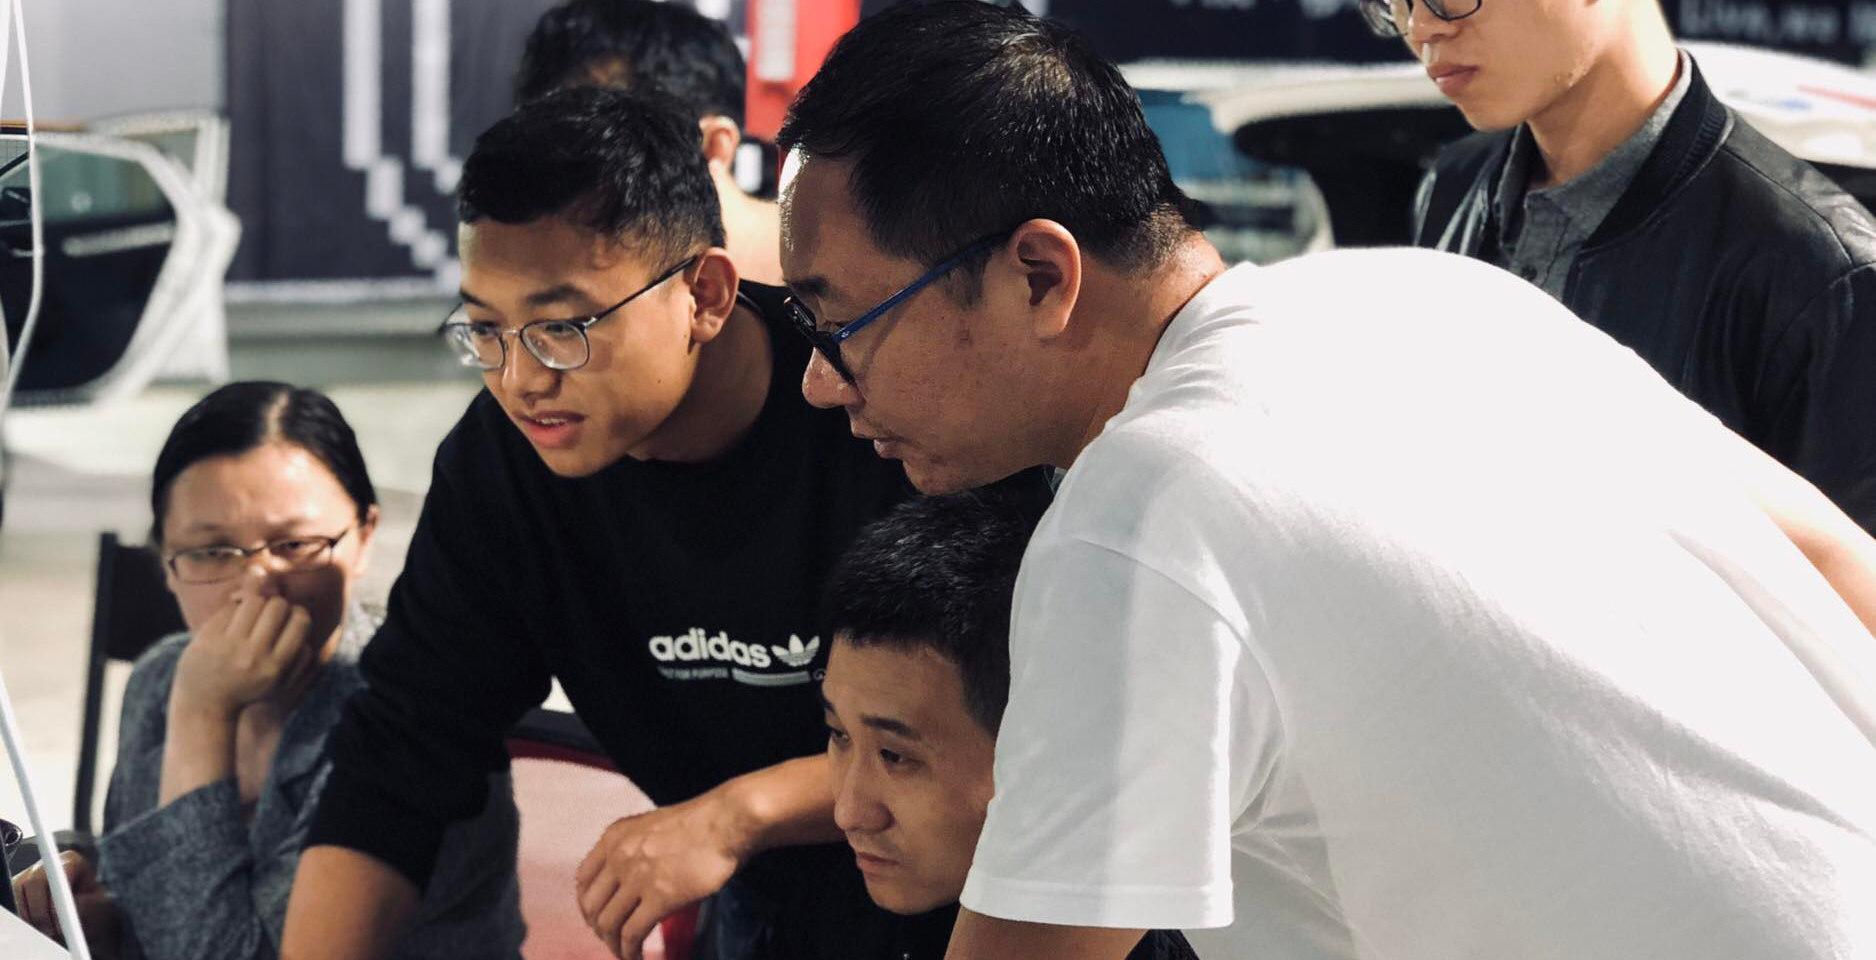 self-driving engineer training base